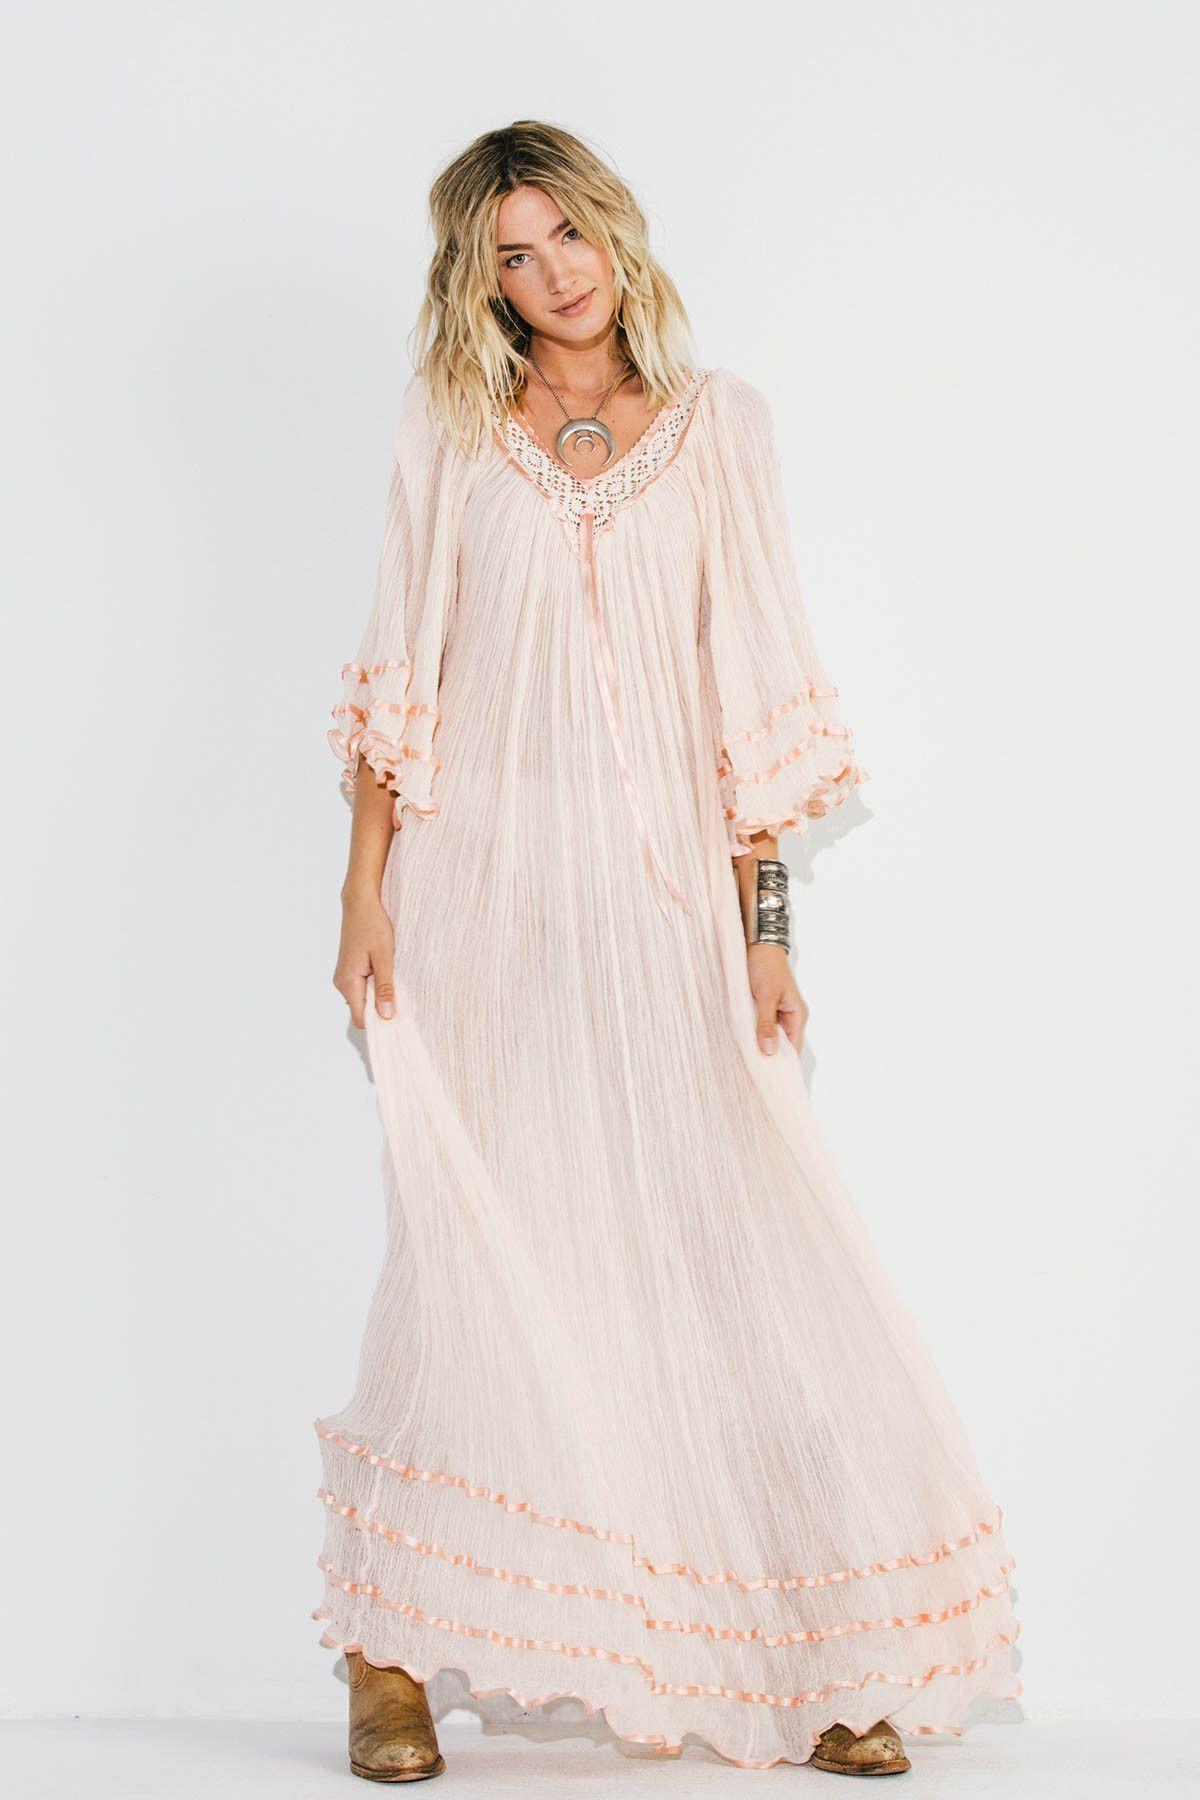 Stevie Nicks Maxi Dress Chic Maxi Dresses Bohemian Style Dresses Maxi Dress [ 1800 x 1200 Pixel ]